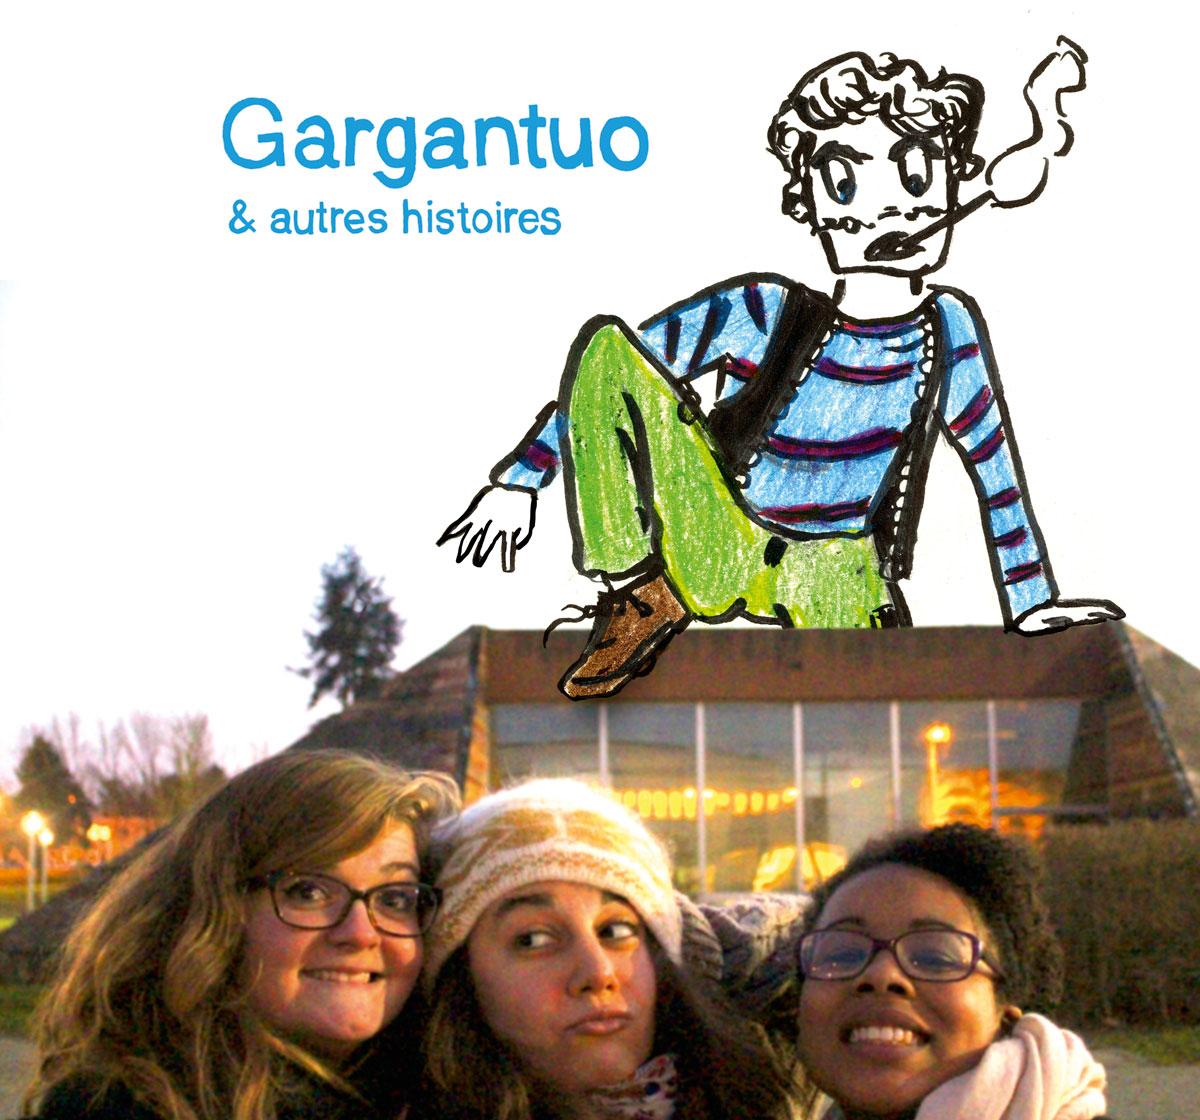 Gargantuo et autreshistoires